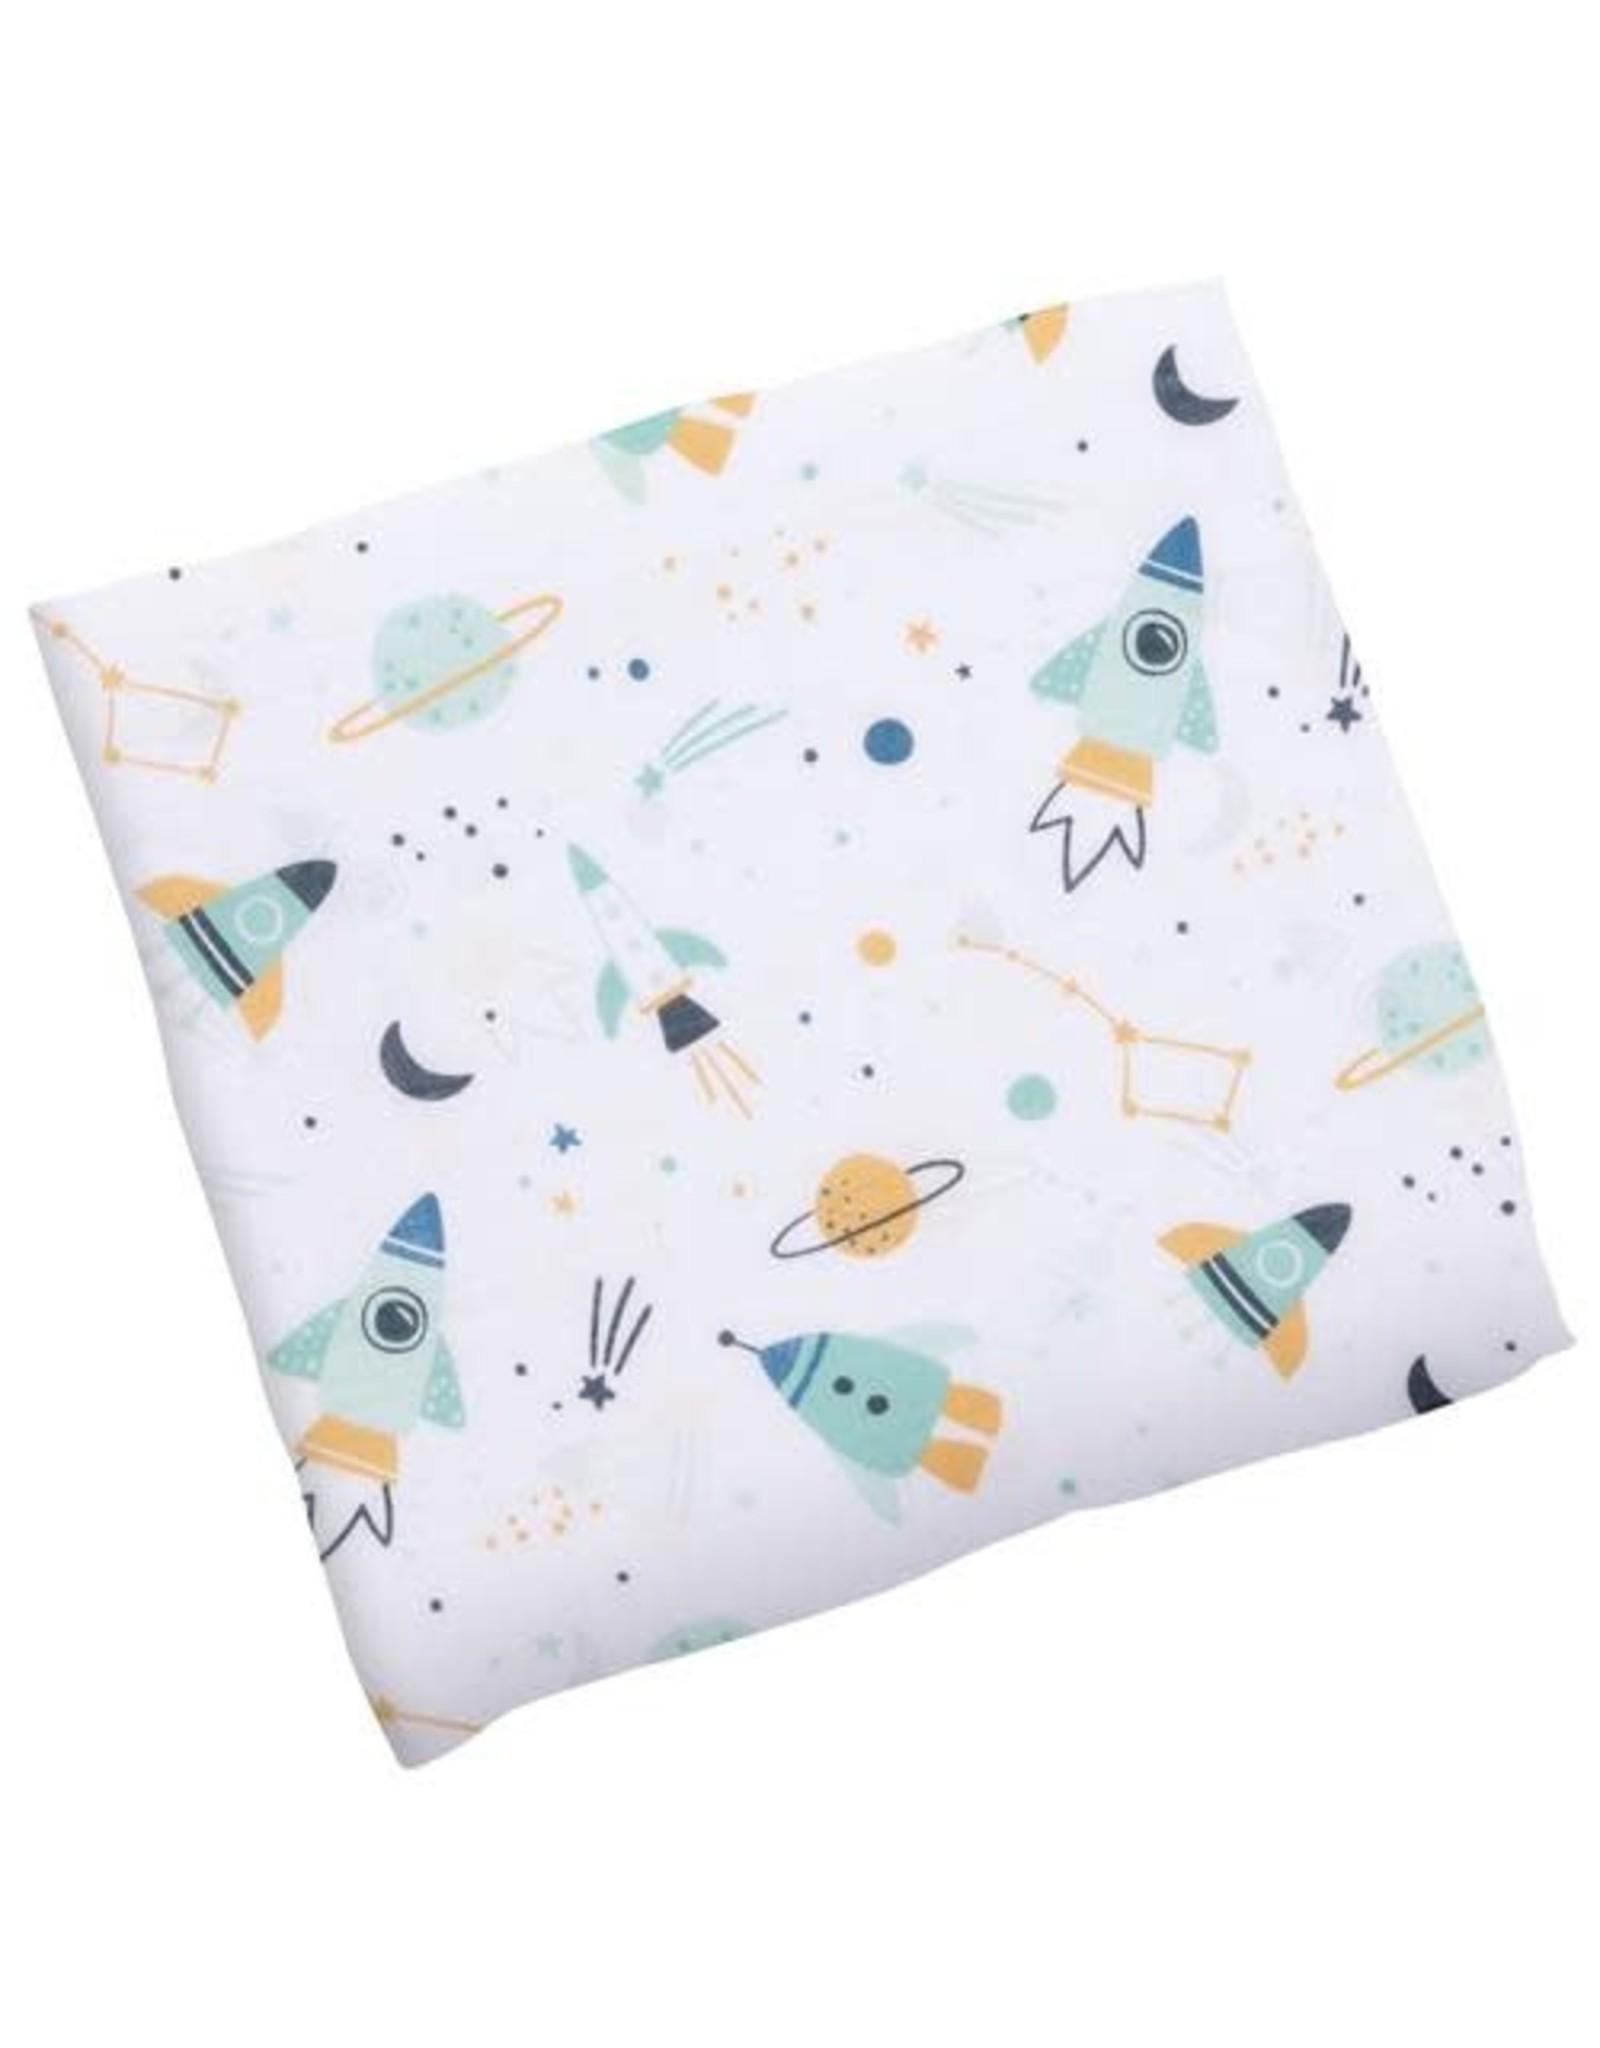 stephen joseph Stephen Joseph- Space Cotton Muslin Blanket